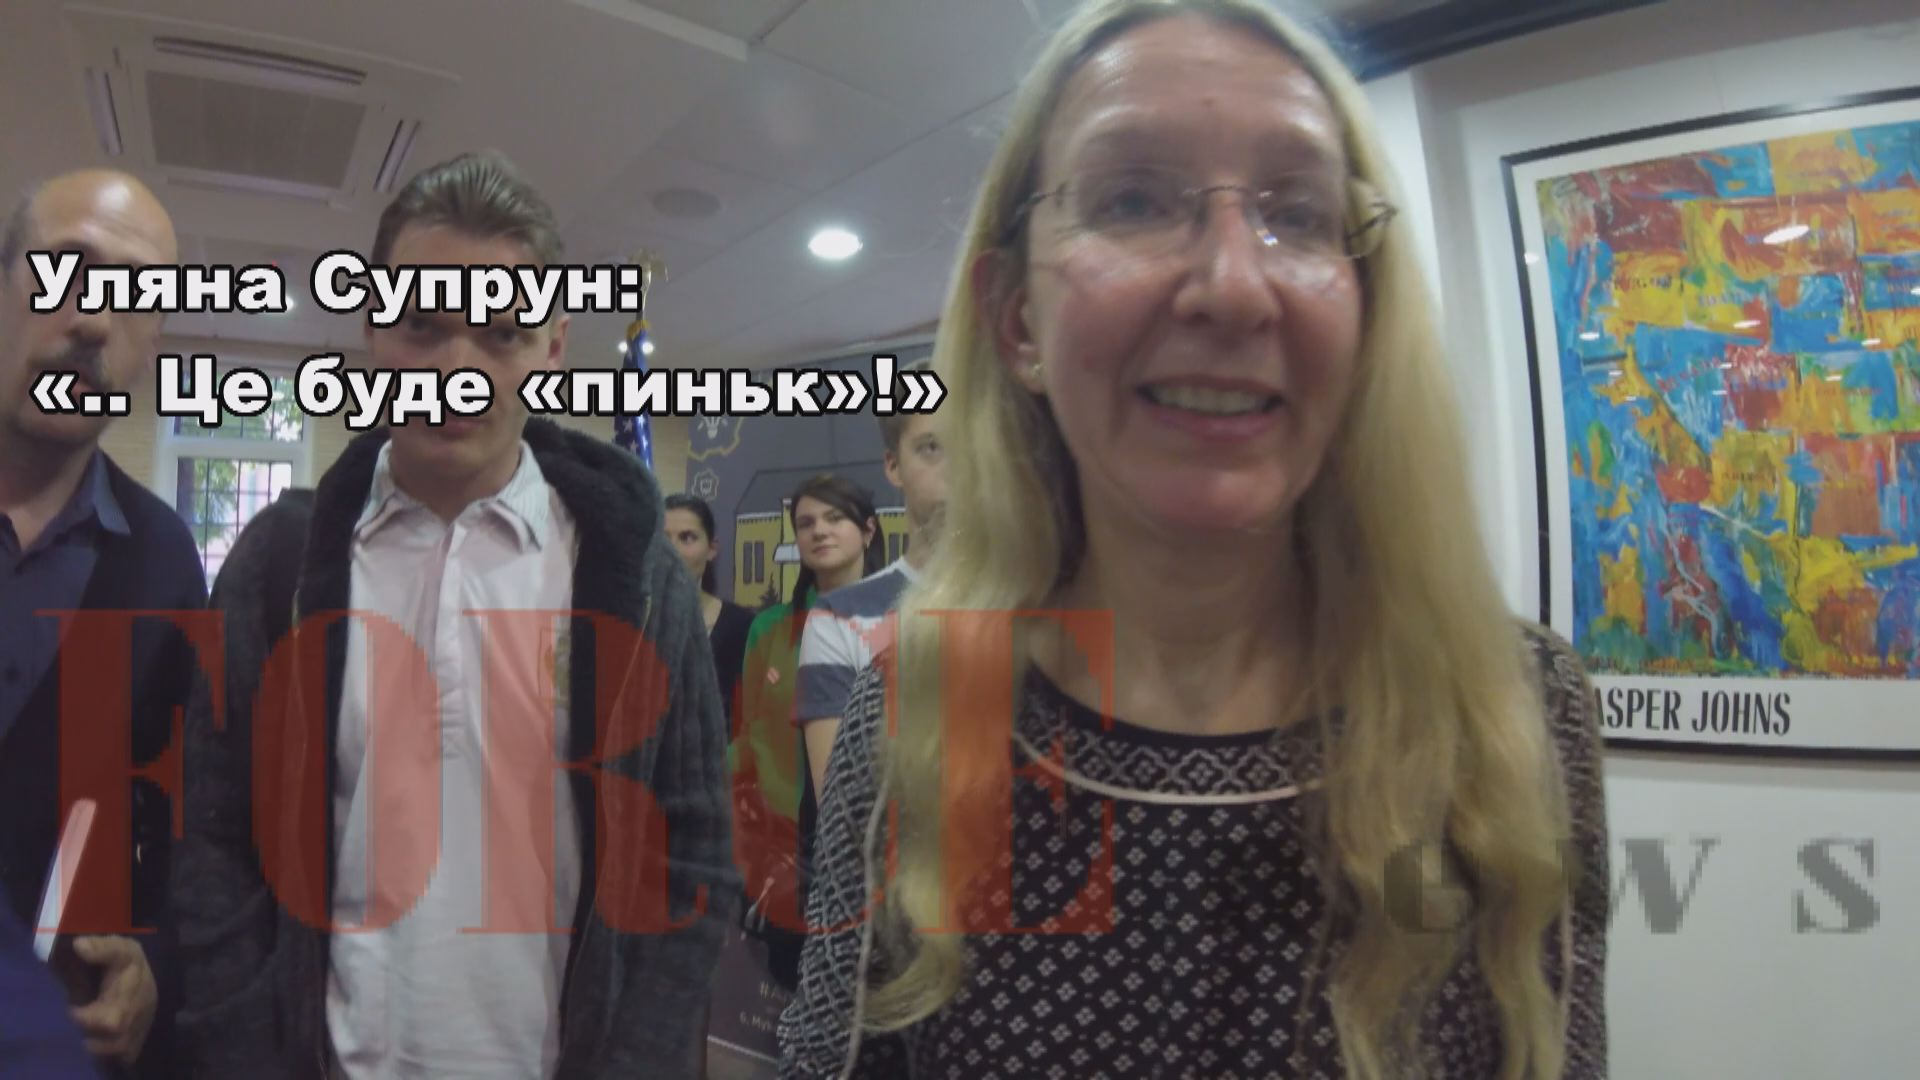 Уляна Супрун:  «.. Це буде просто «пиньк»!»